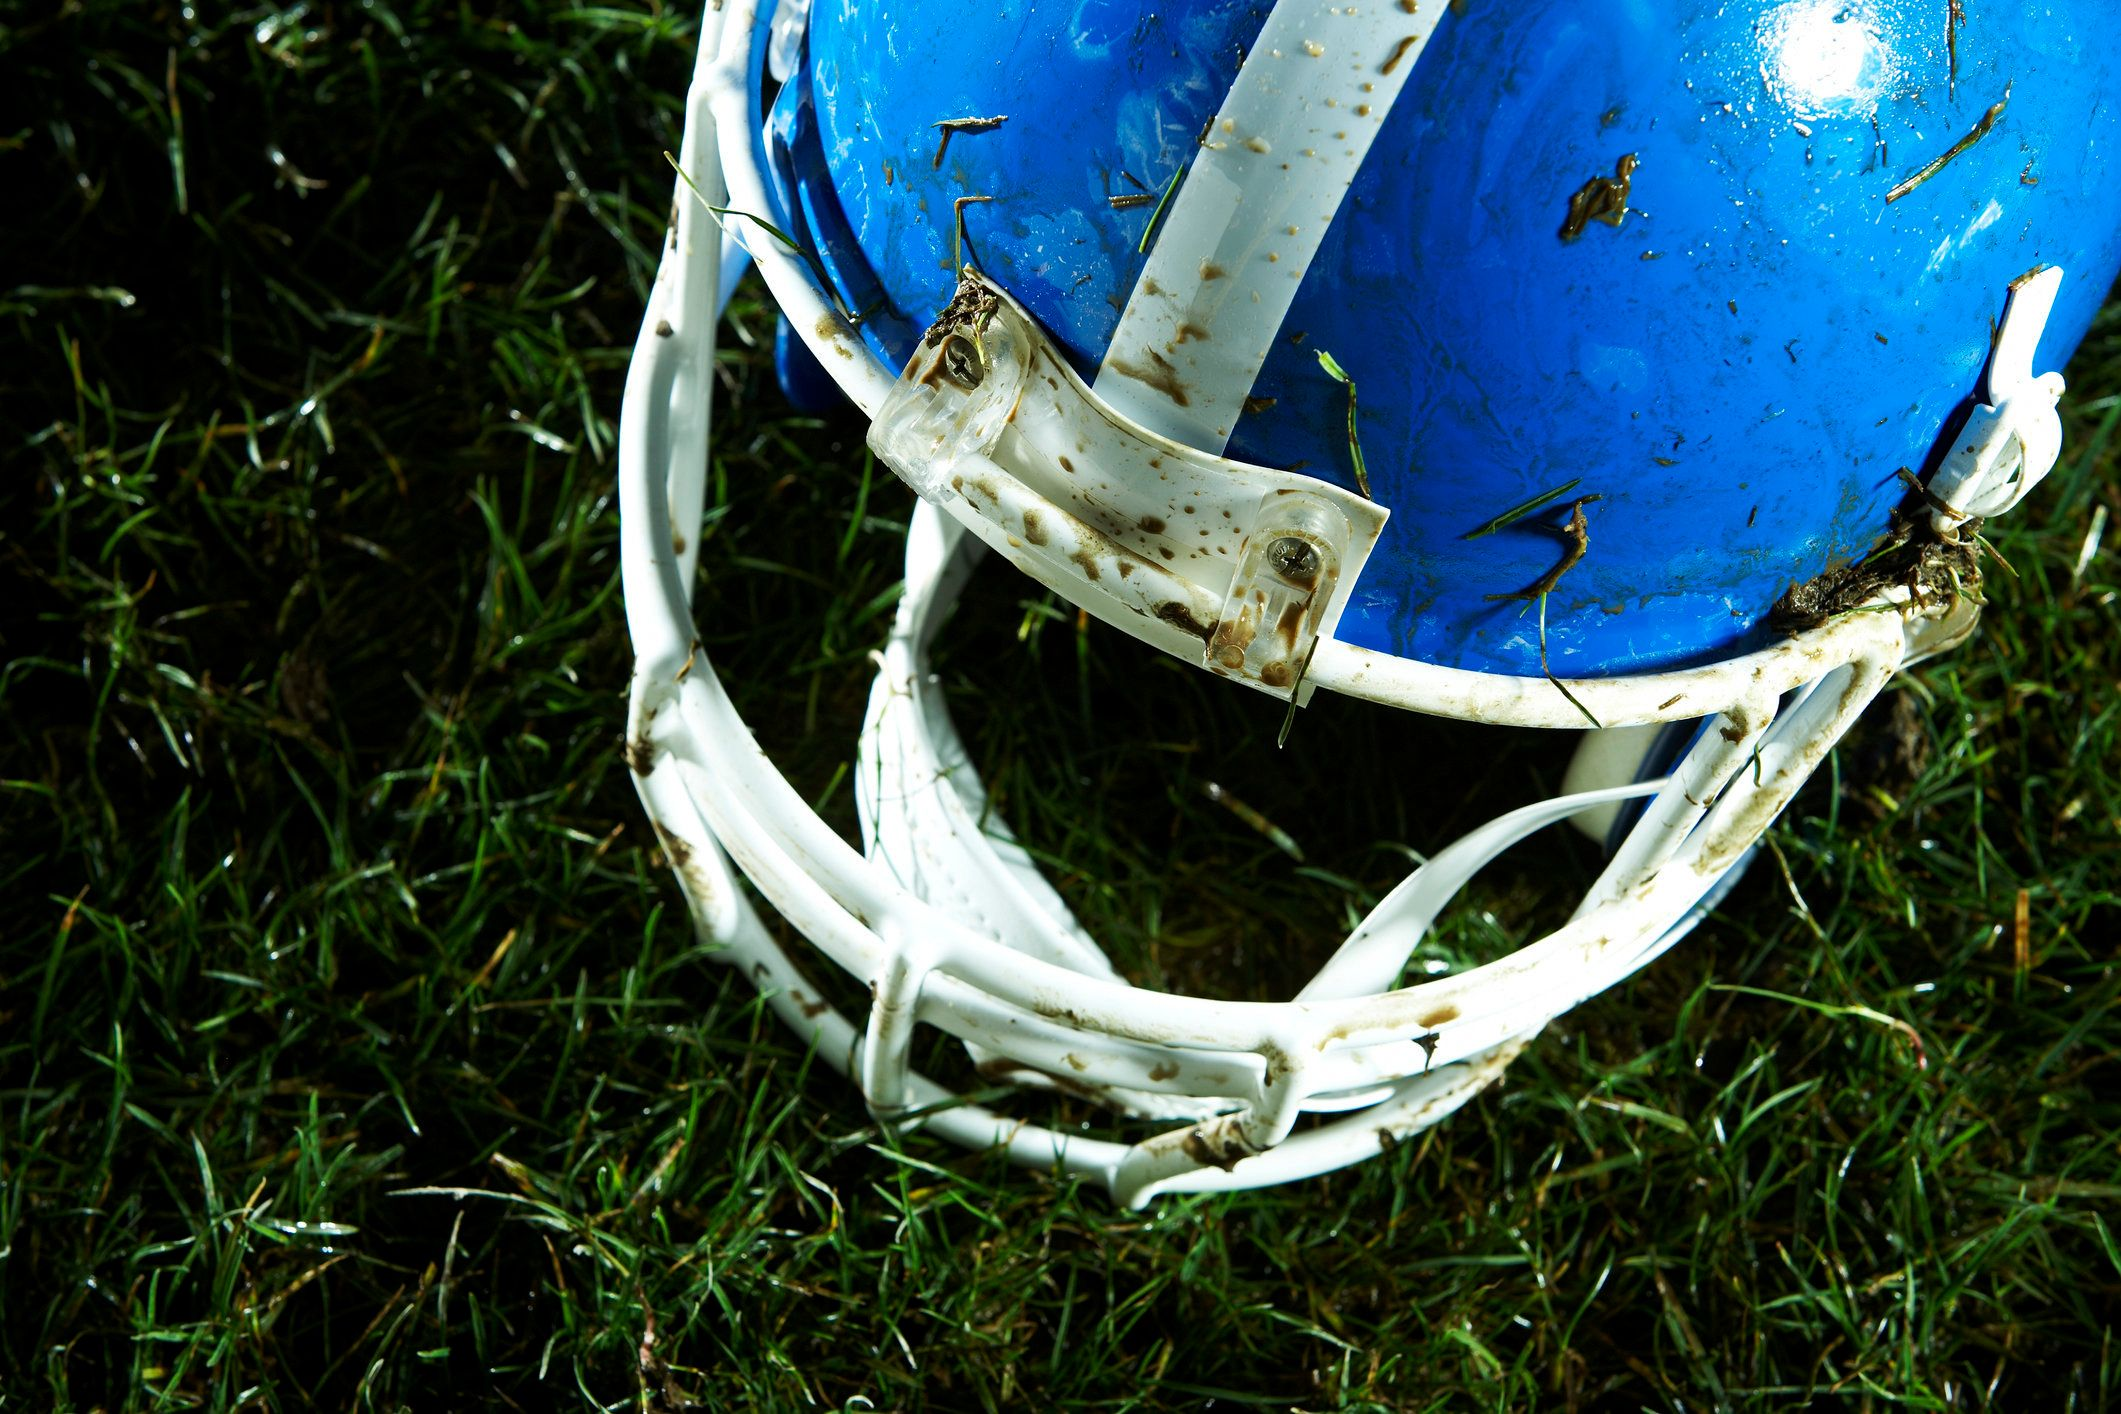 Football helmet on grass